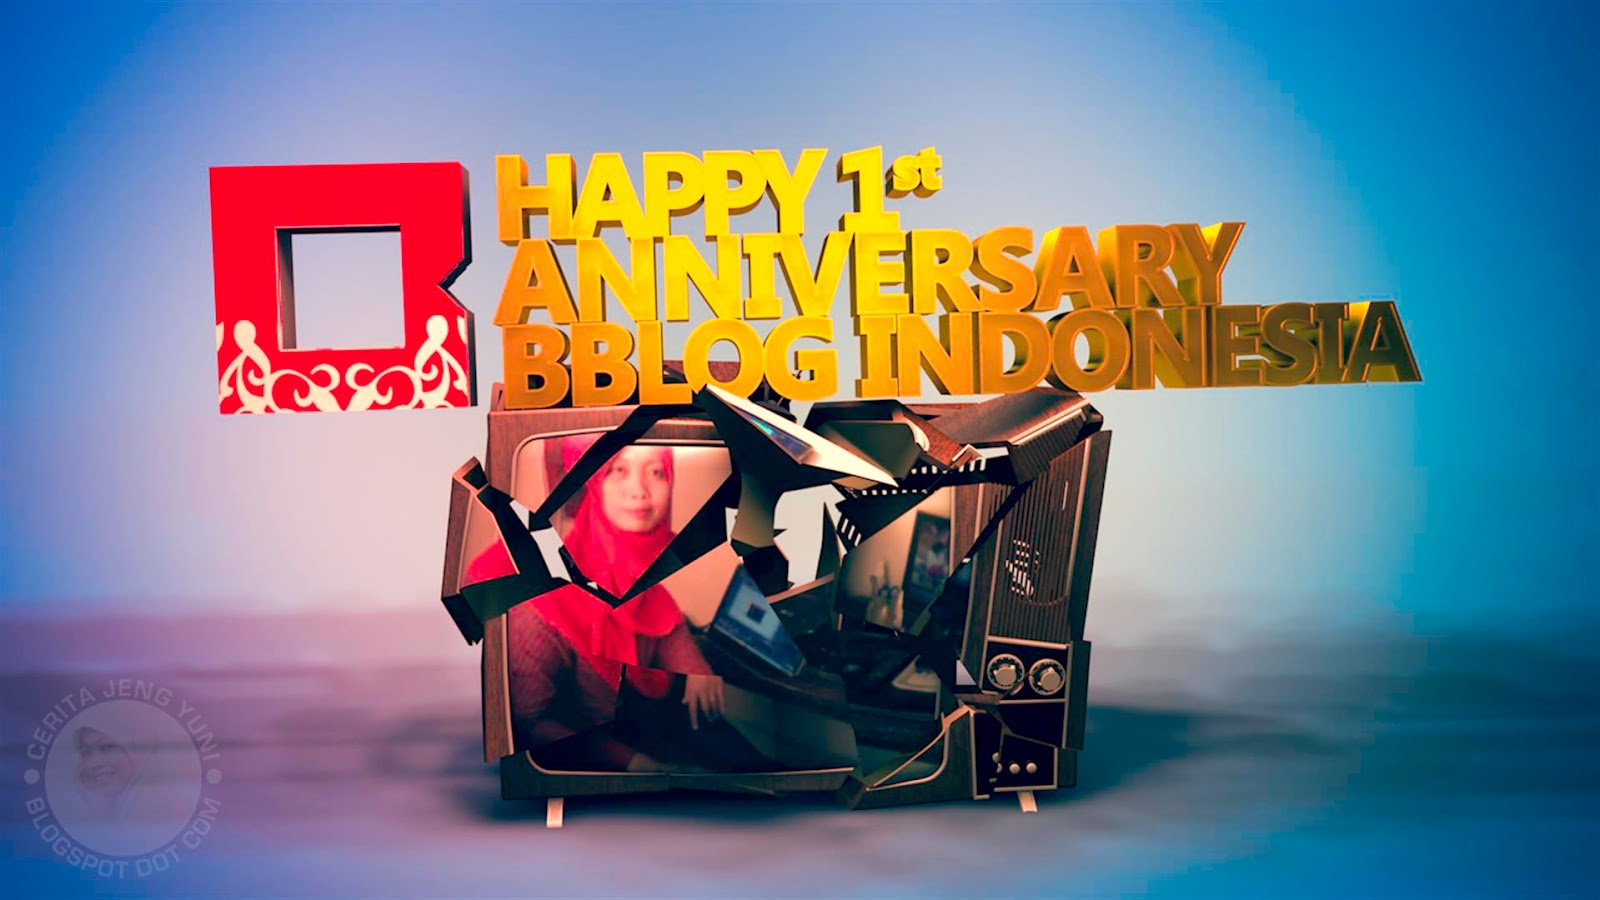 1st Anniversary Bblog Indonesia